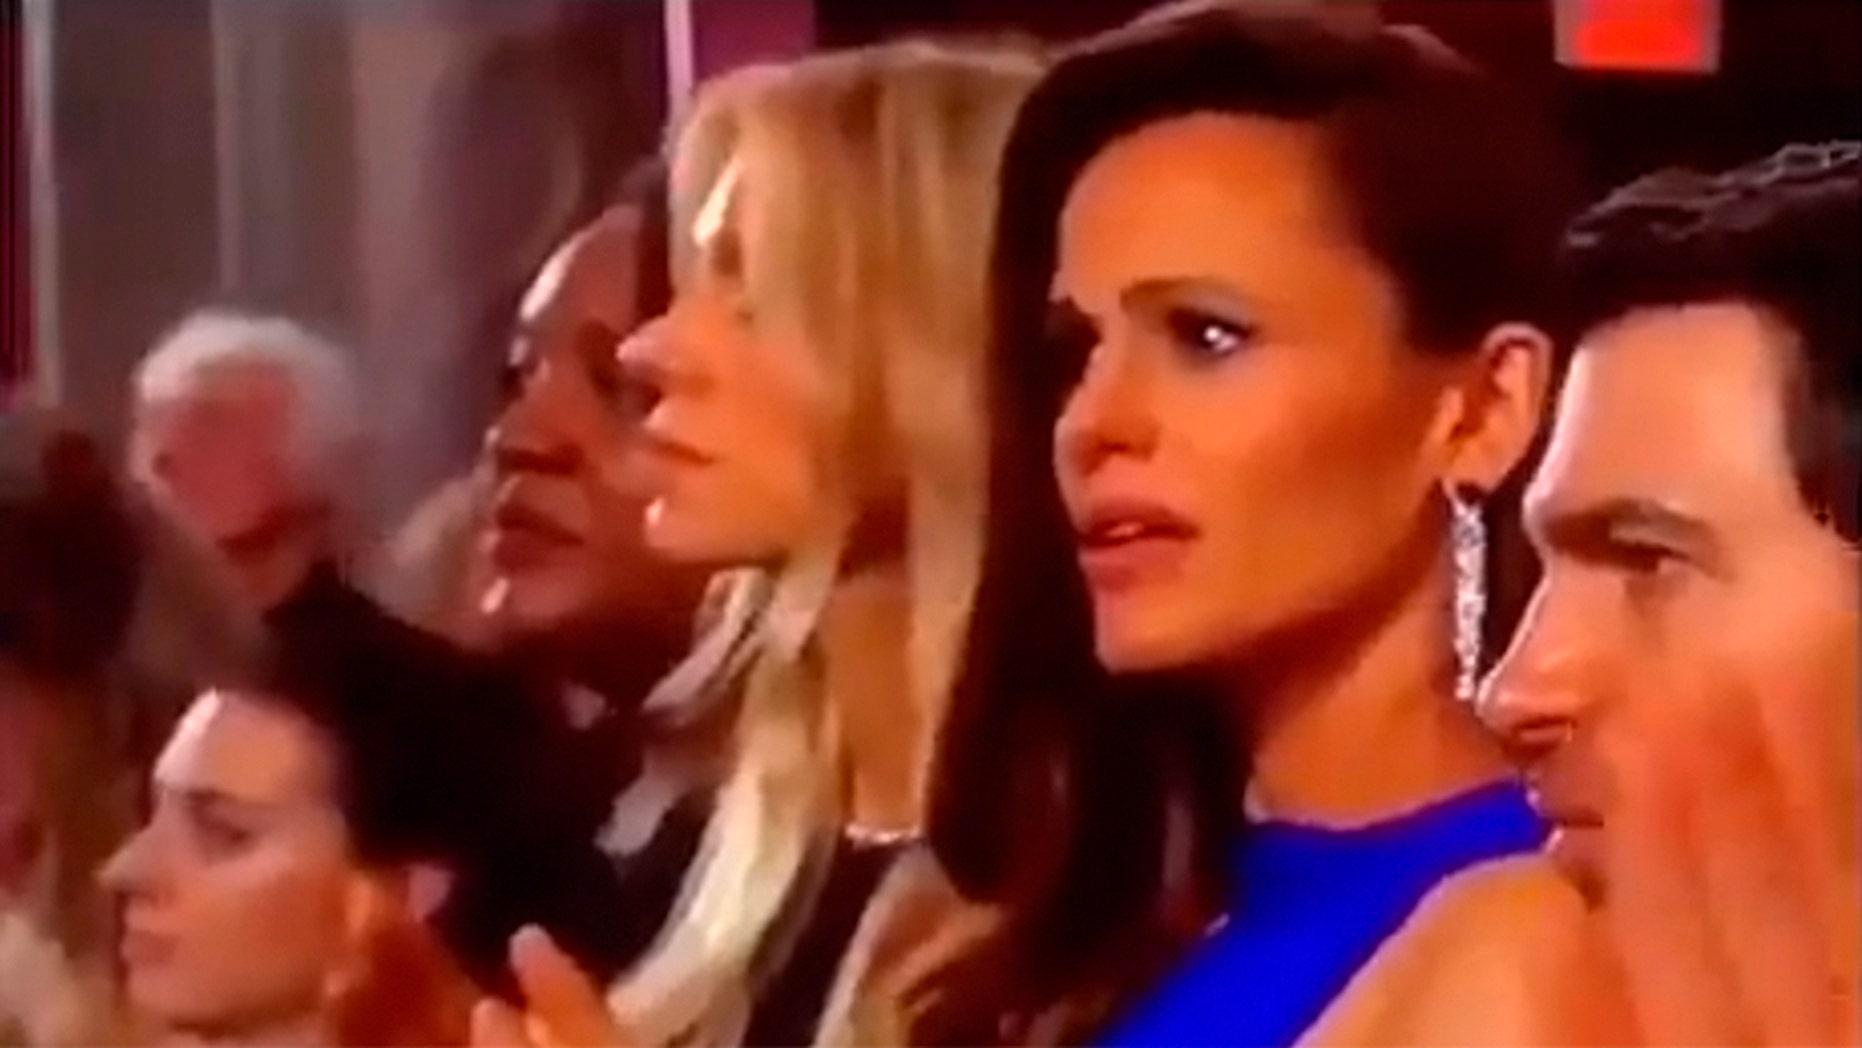 Jennifer Garner's shocked look went viral during the Oscars on Sunday night.